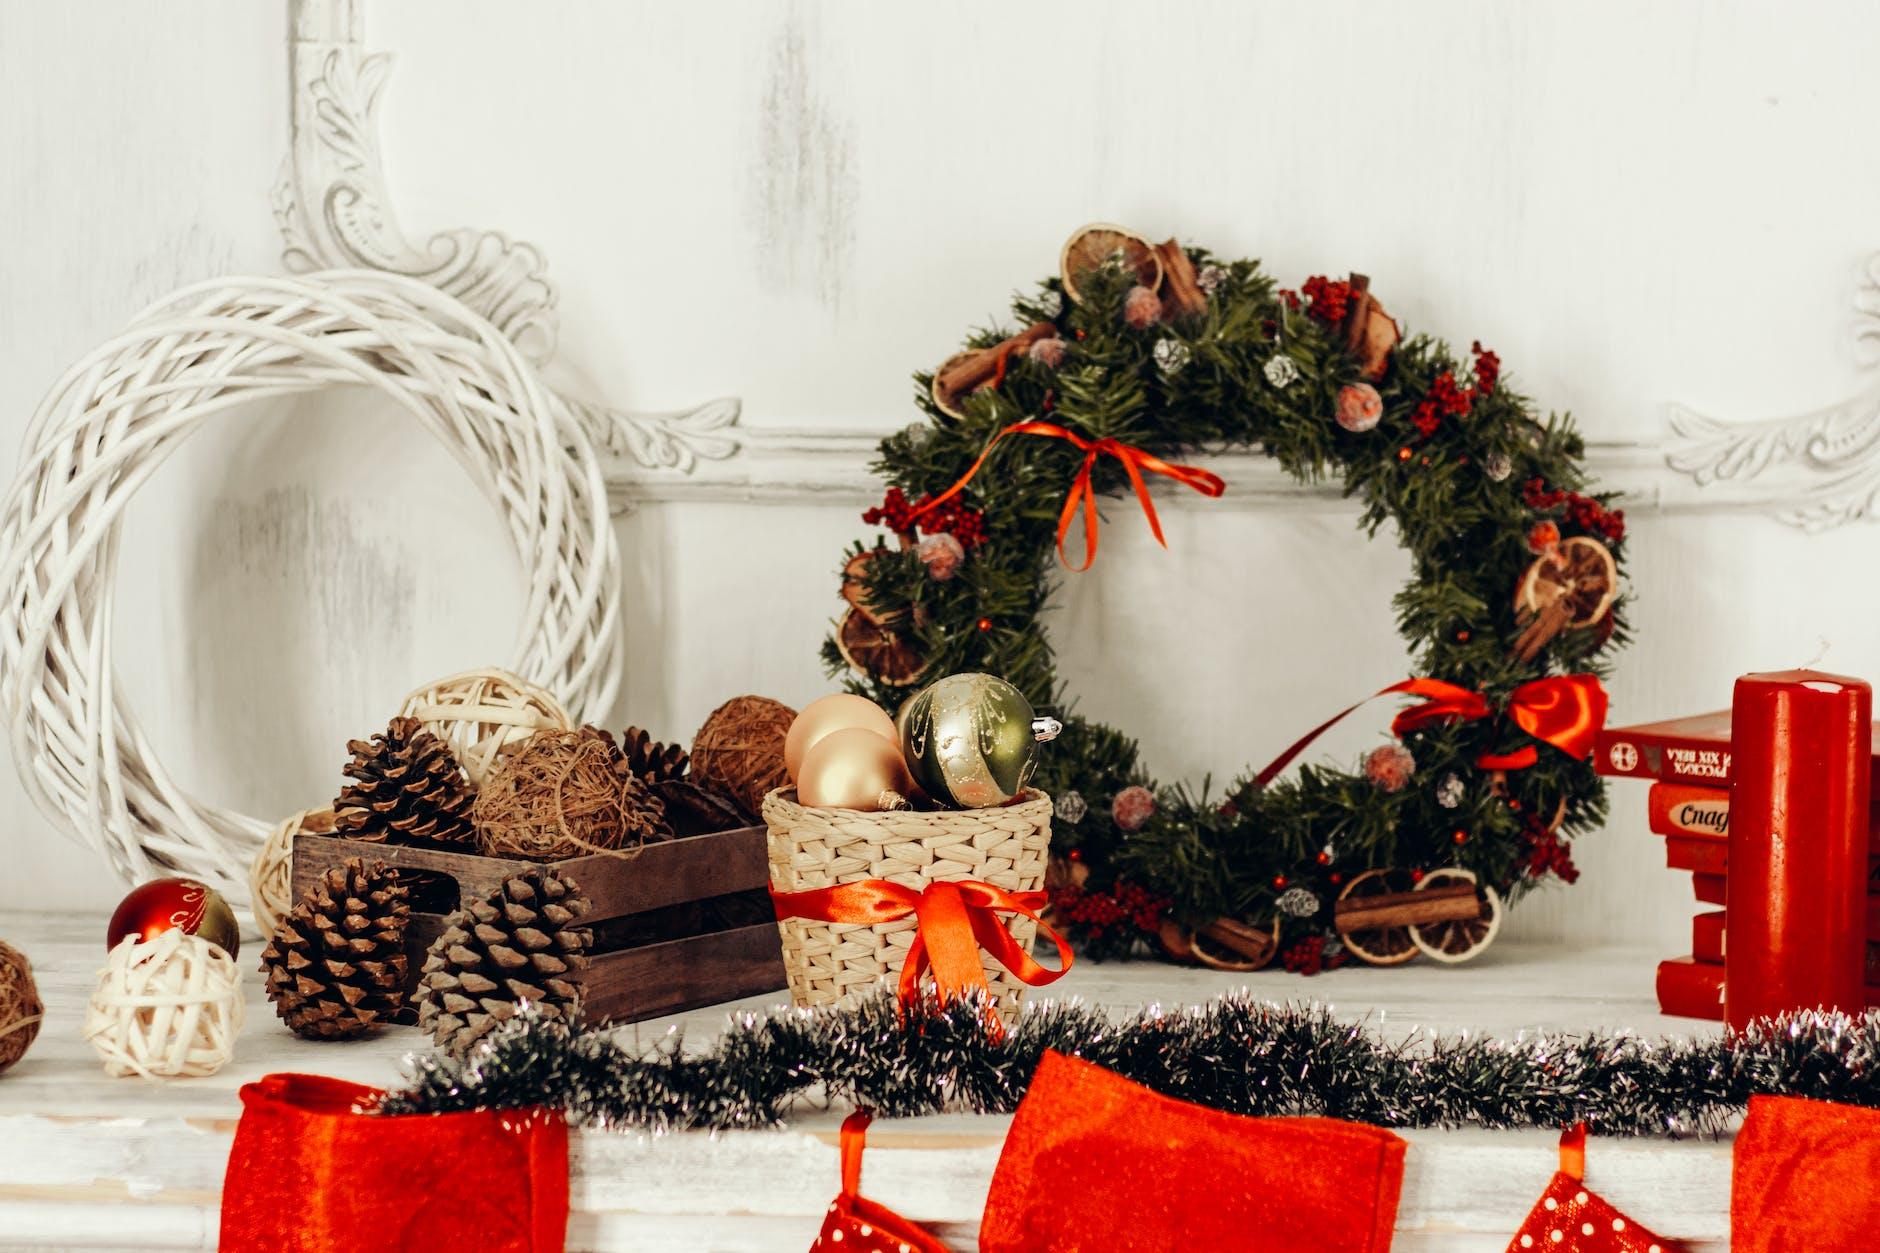 Christmas decoration sale 2019